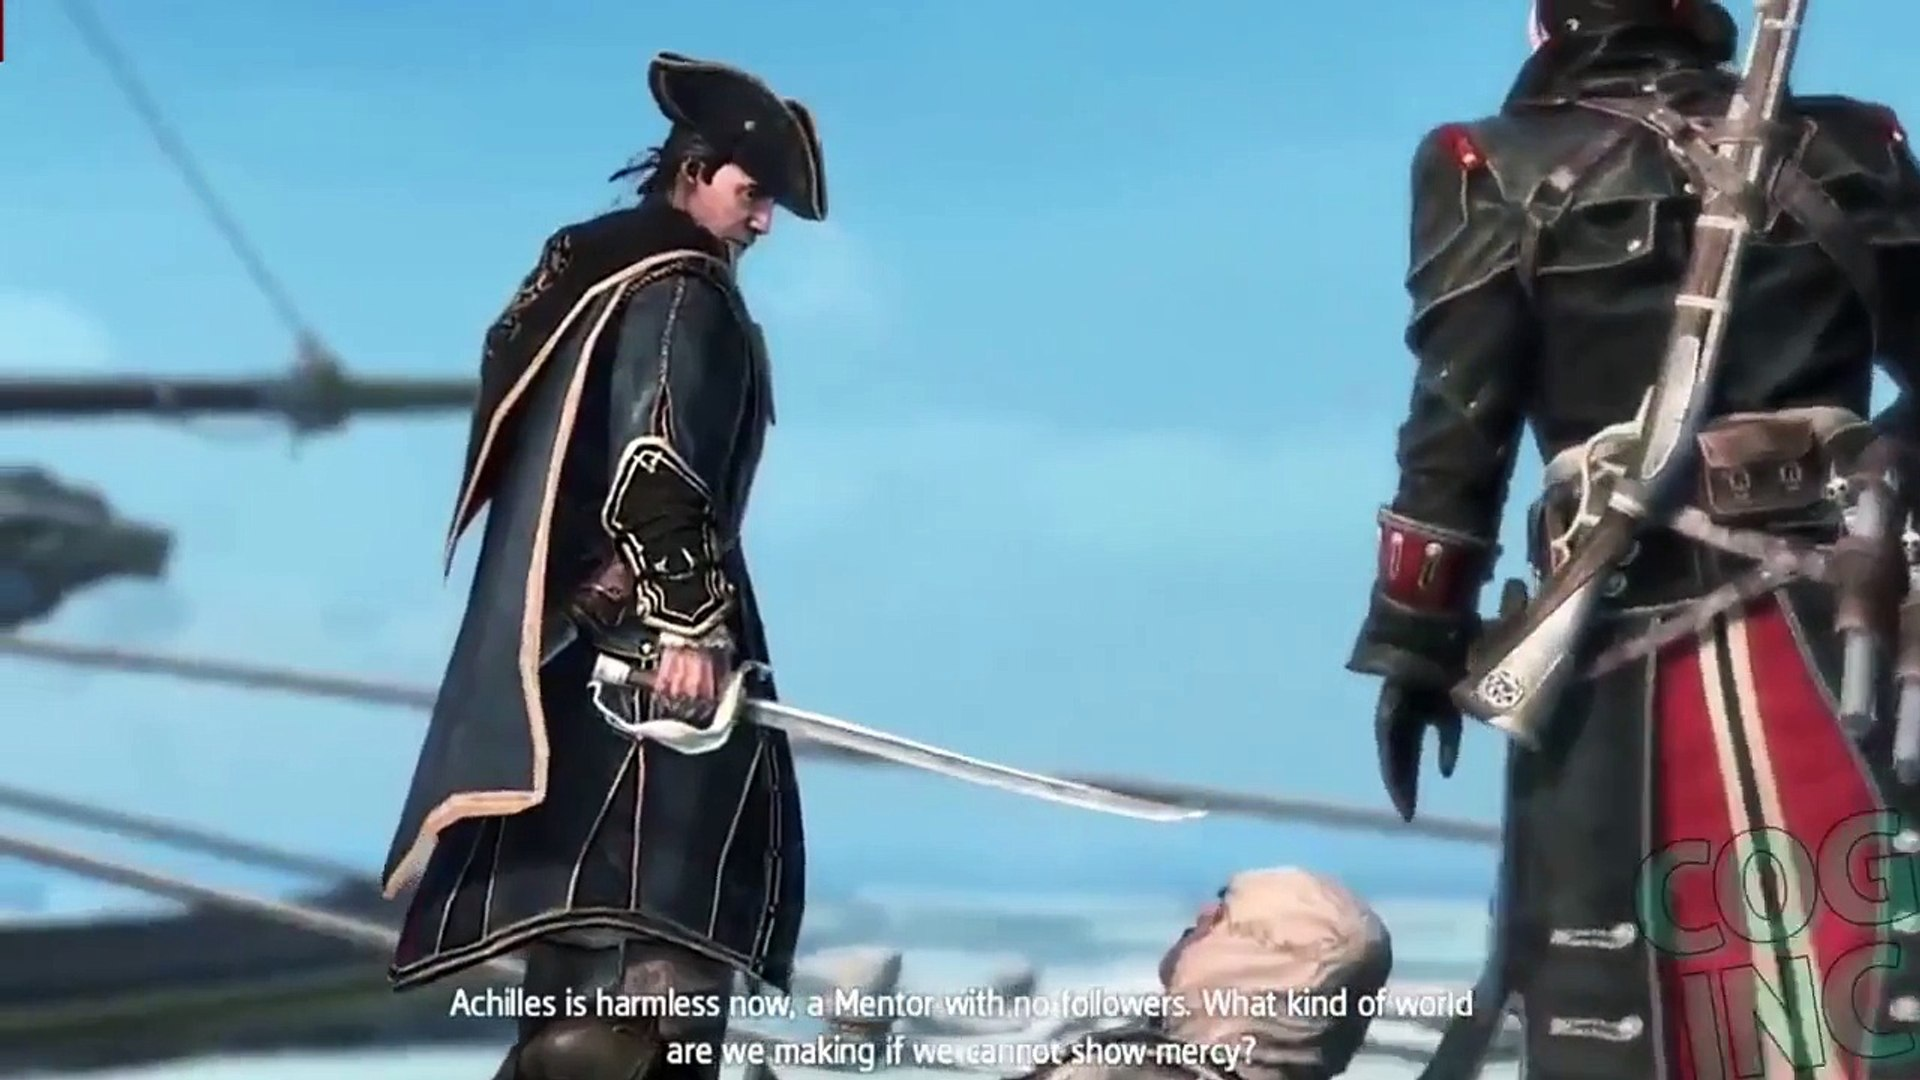 Assassin's Creed Rogue: Final - Boss - Fight - Ending (AC Rogue Ending) [1080p]